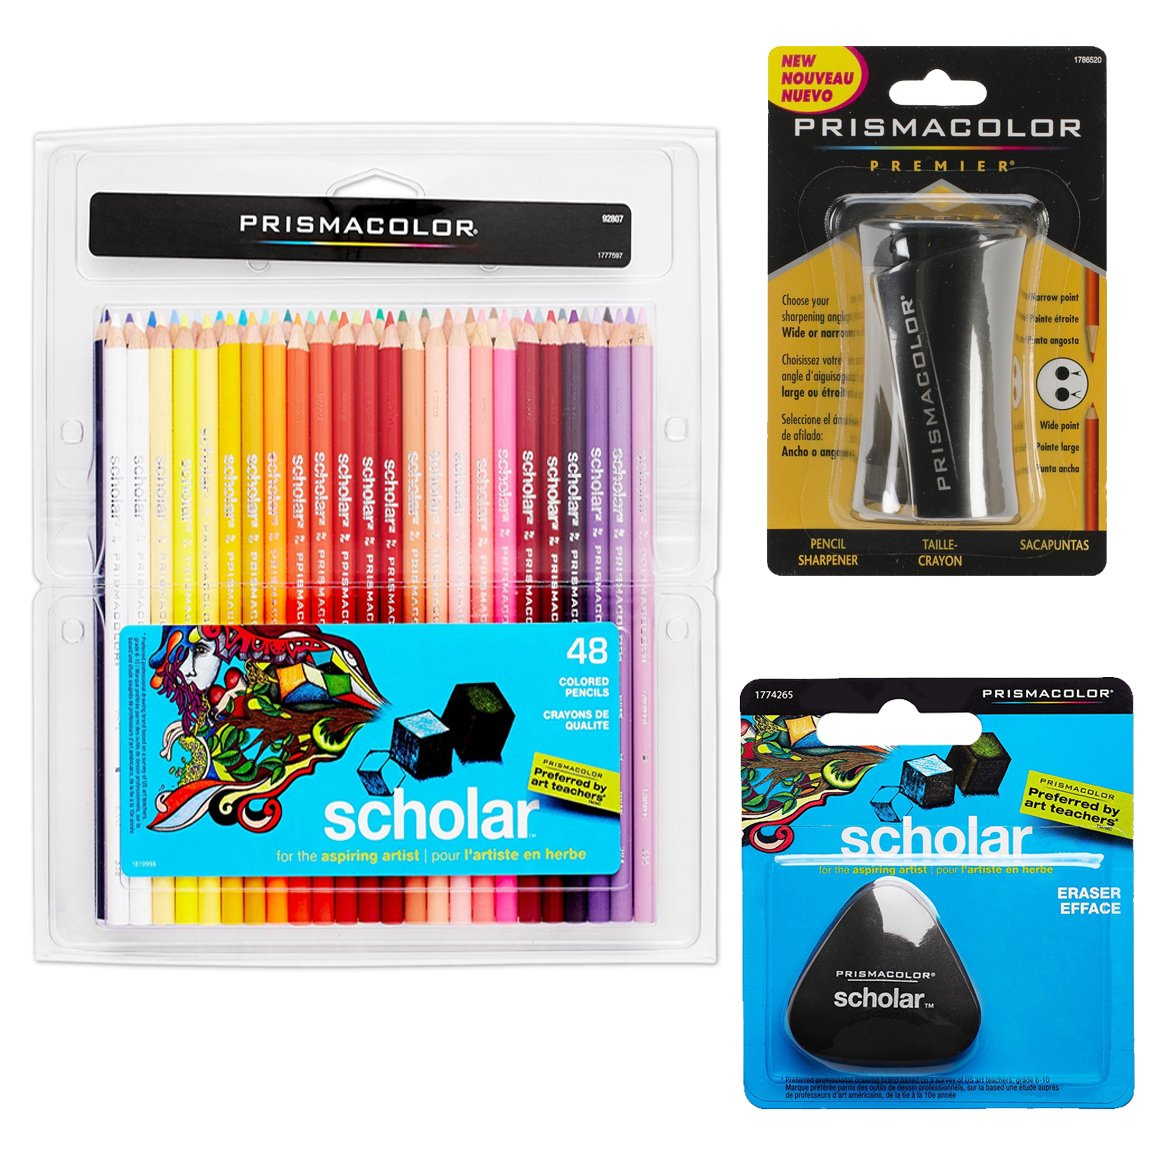 Prismacolor Scholar Colored Pencils 48-Count, Triangular Scholar Pencil Eraser and Premier Pencil Sharpener